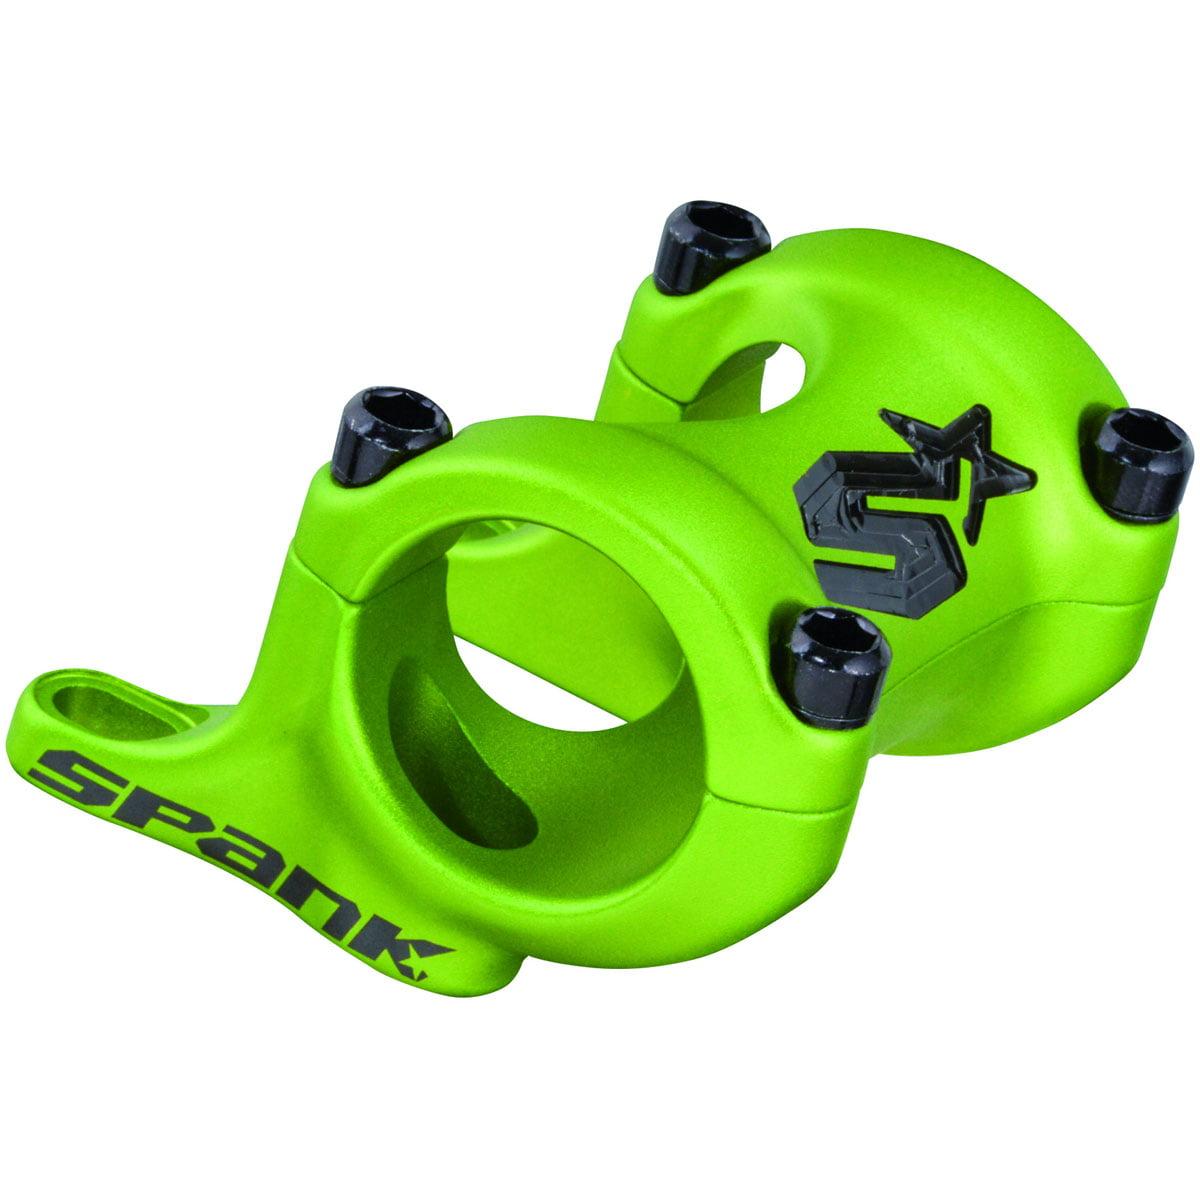 Spank SPIKE 25/30 DM Bicycle Stem - Matte Finish - E06SD251